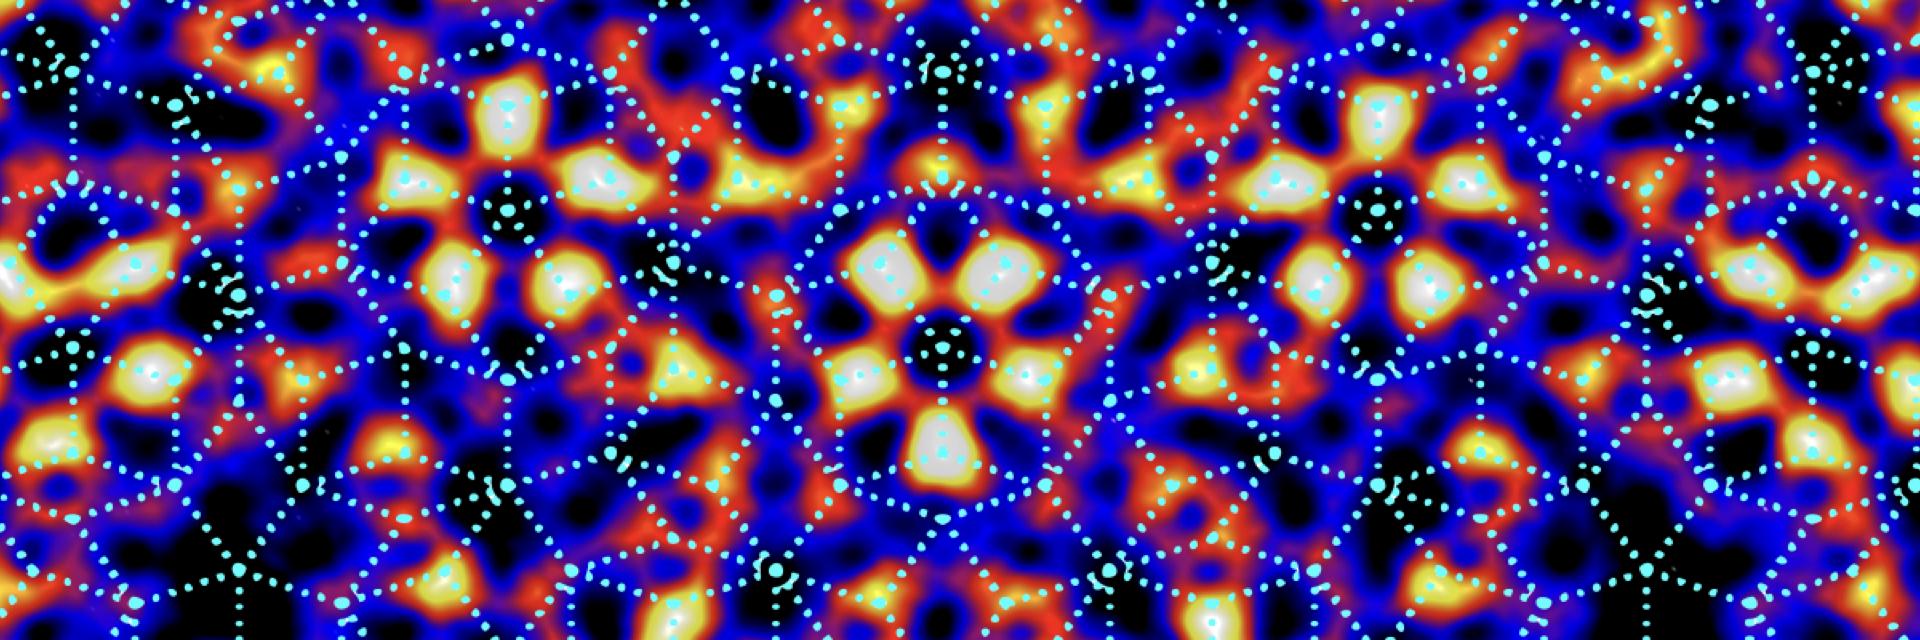 Imaging Quasiperiodic Electronic States